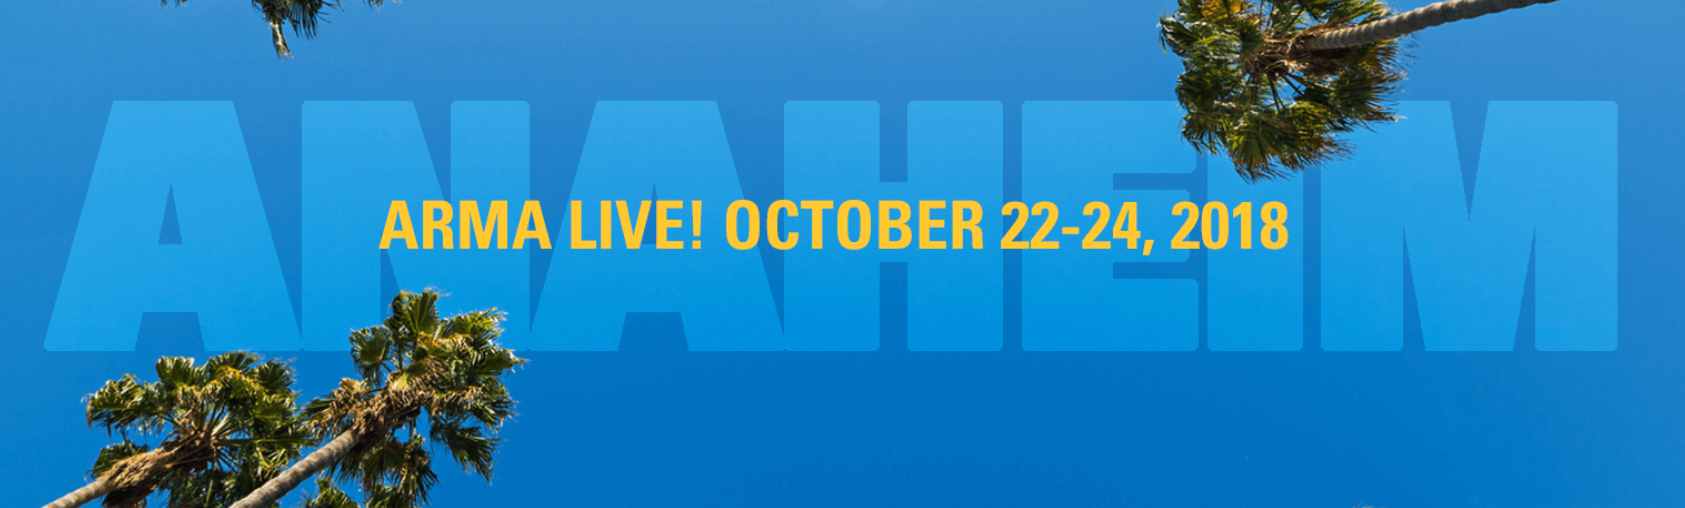 ARMA International Live Conference in Anaheim California 2018